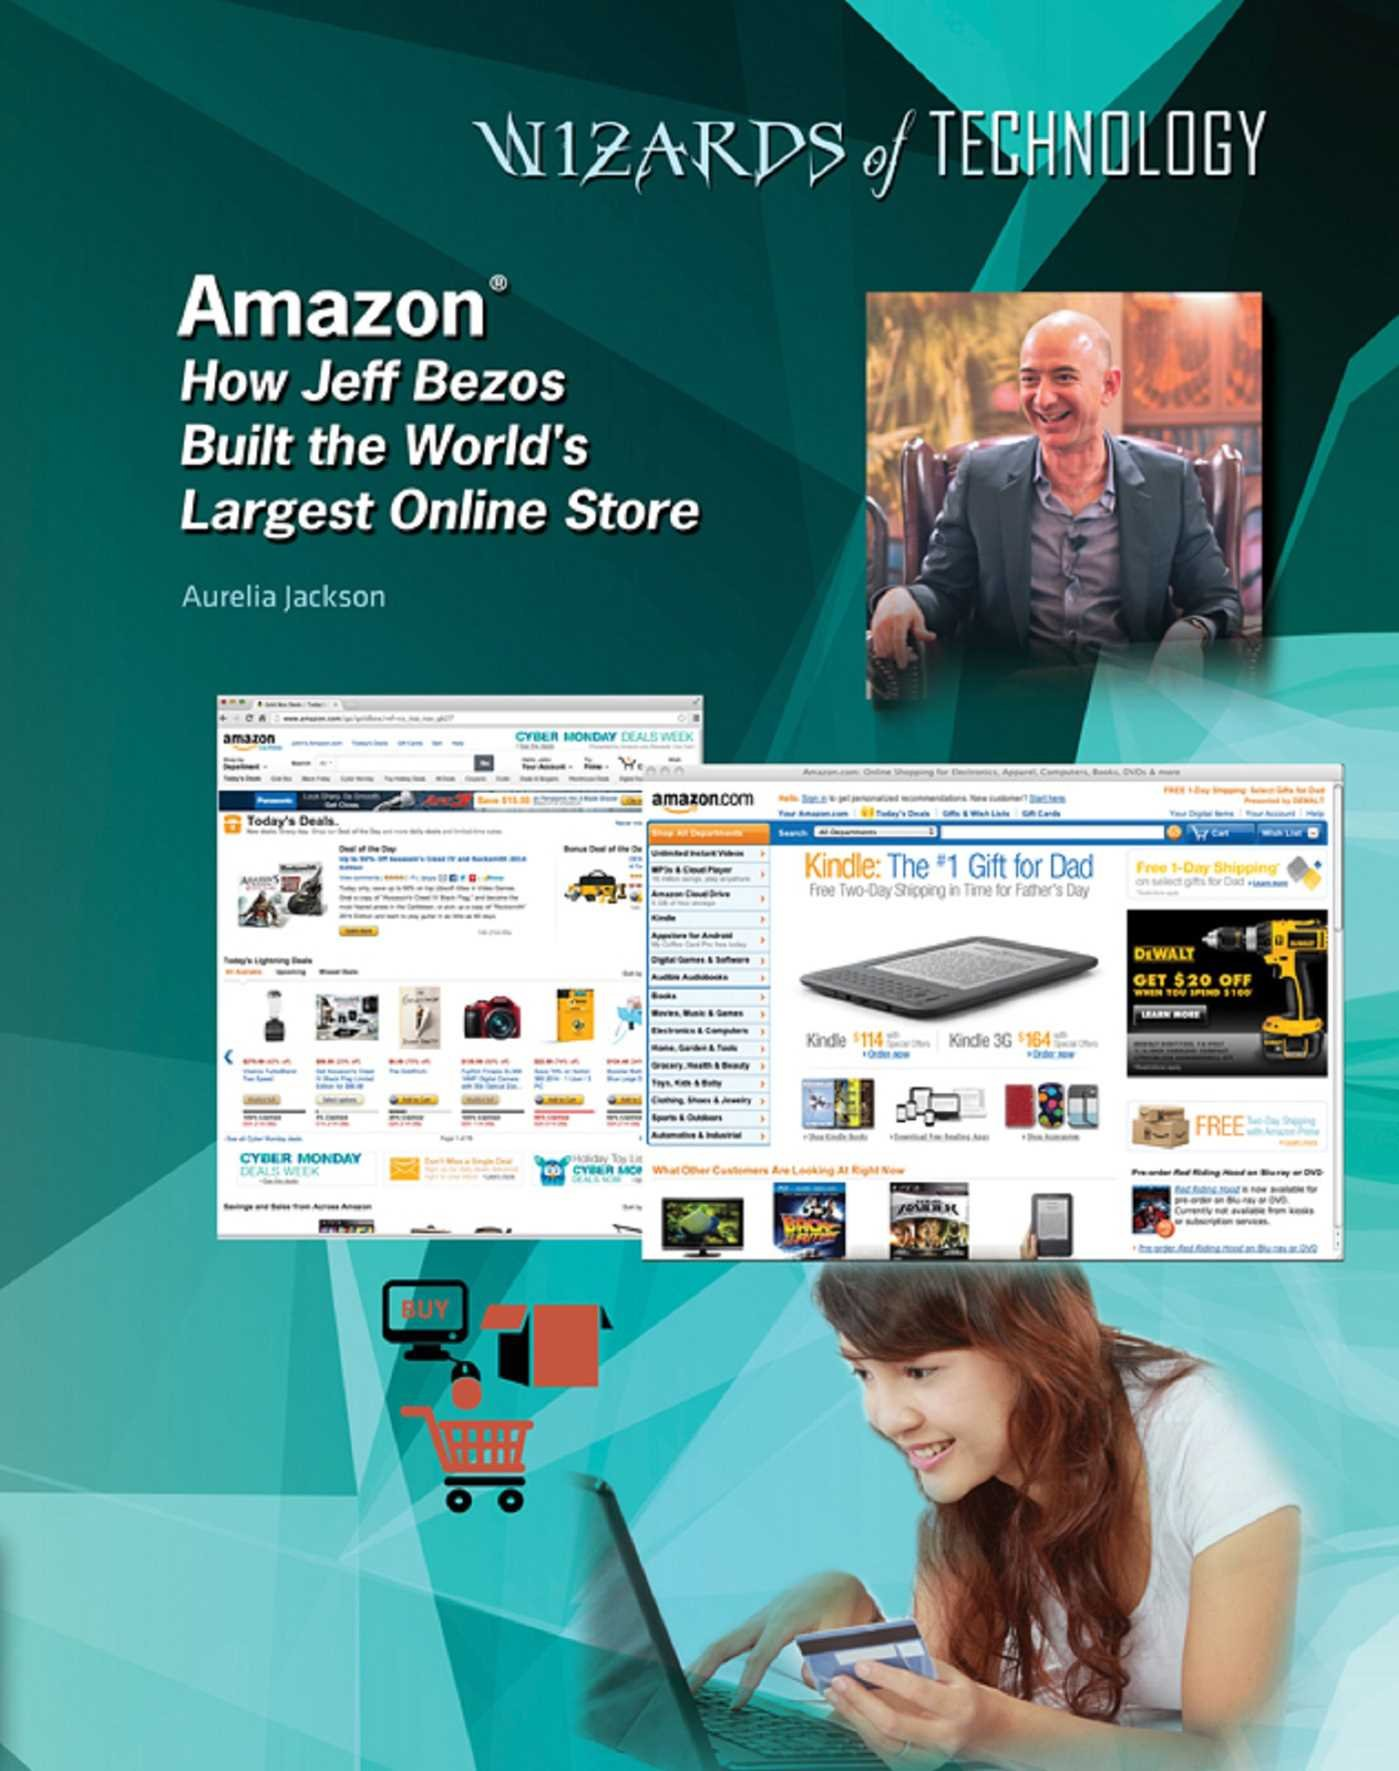 Amazon®: How Jeff Bezos Built the World's Largest Online Store